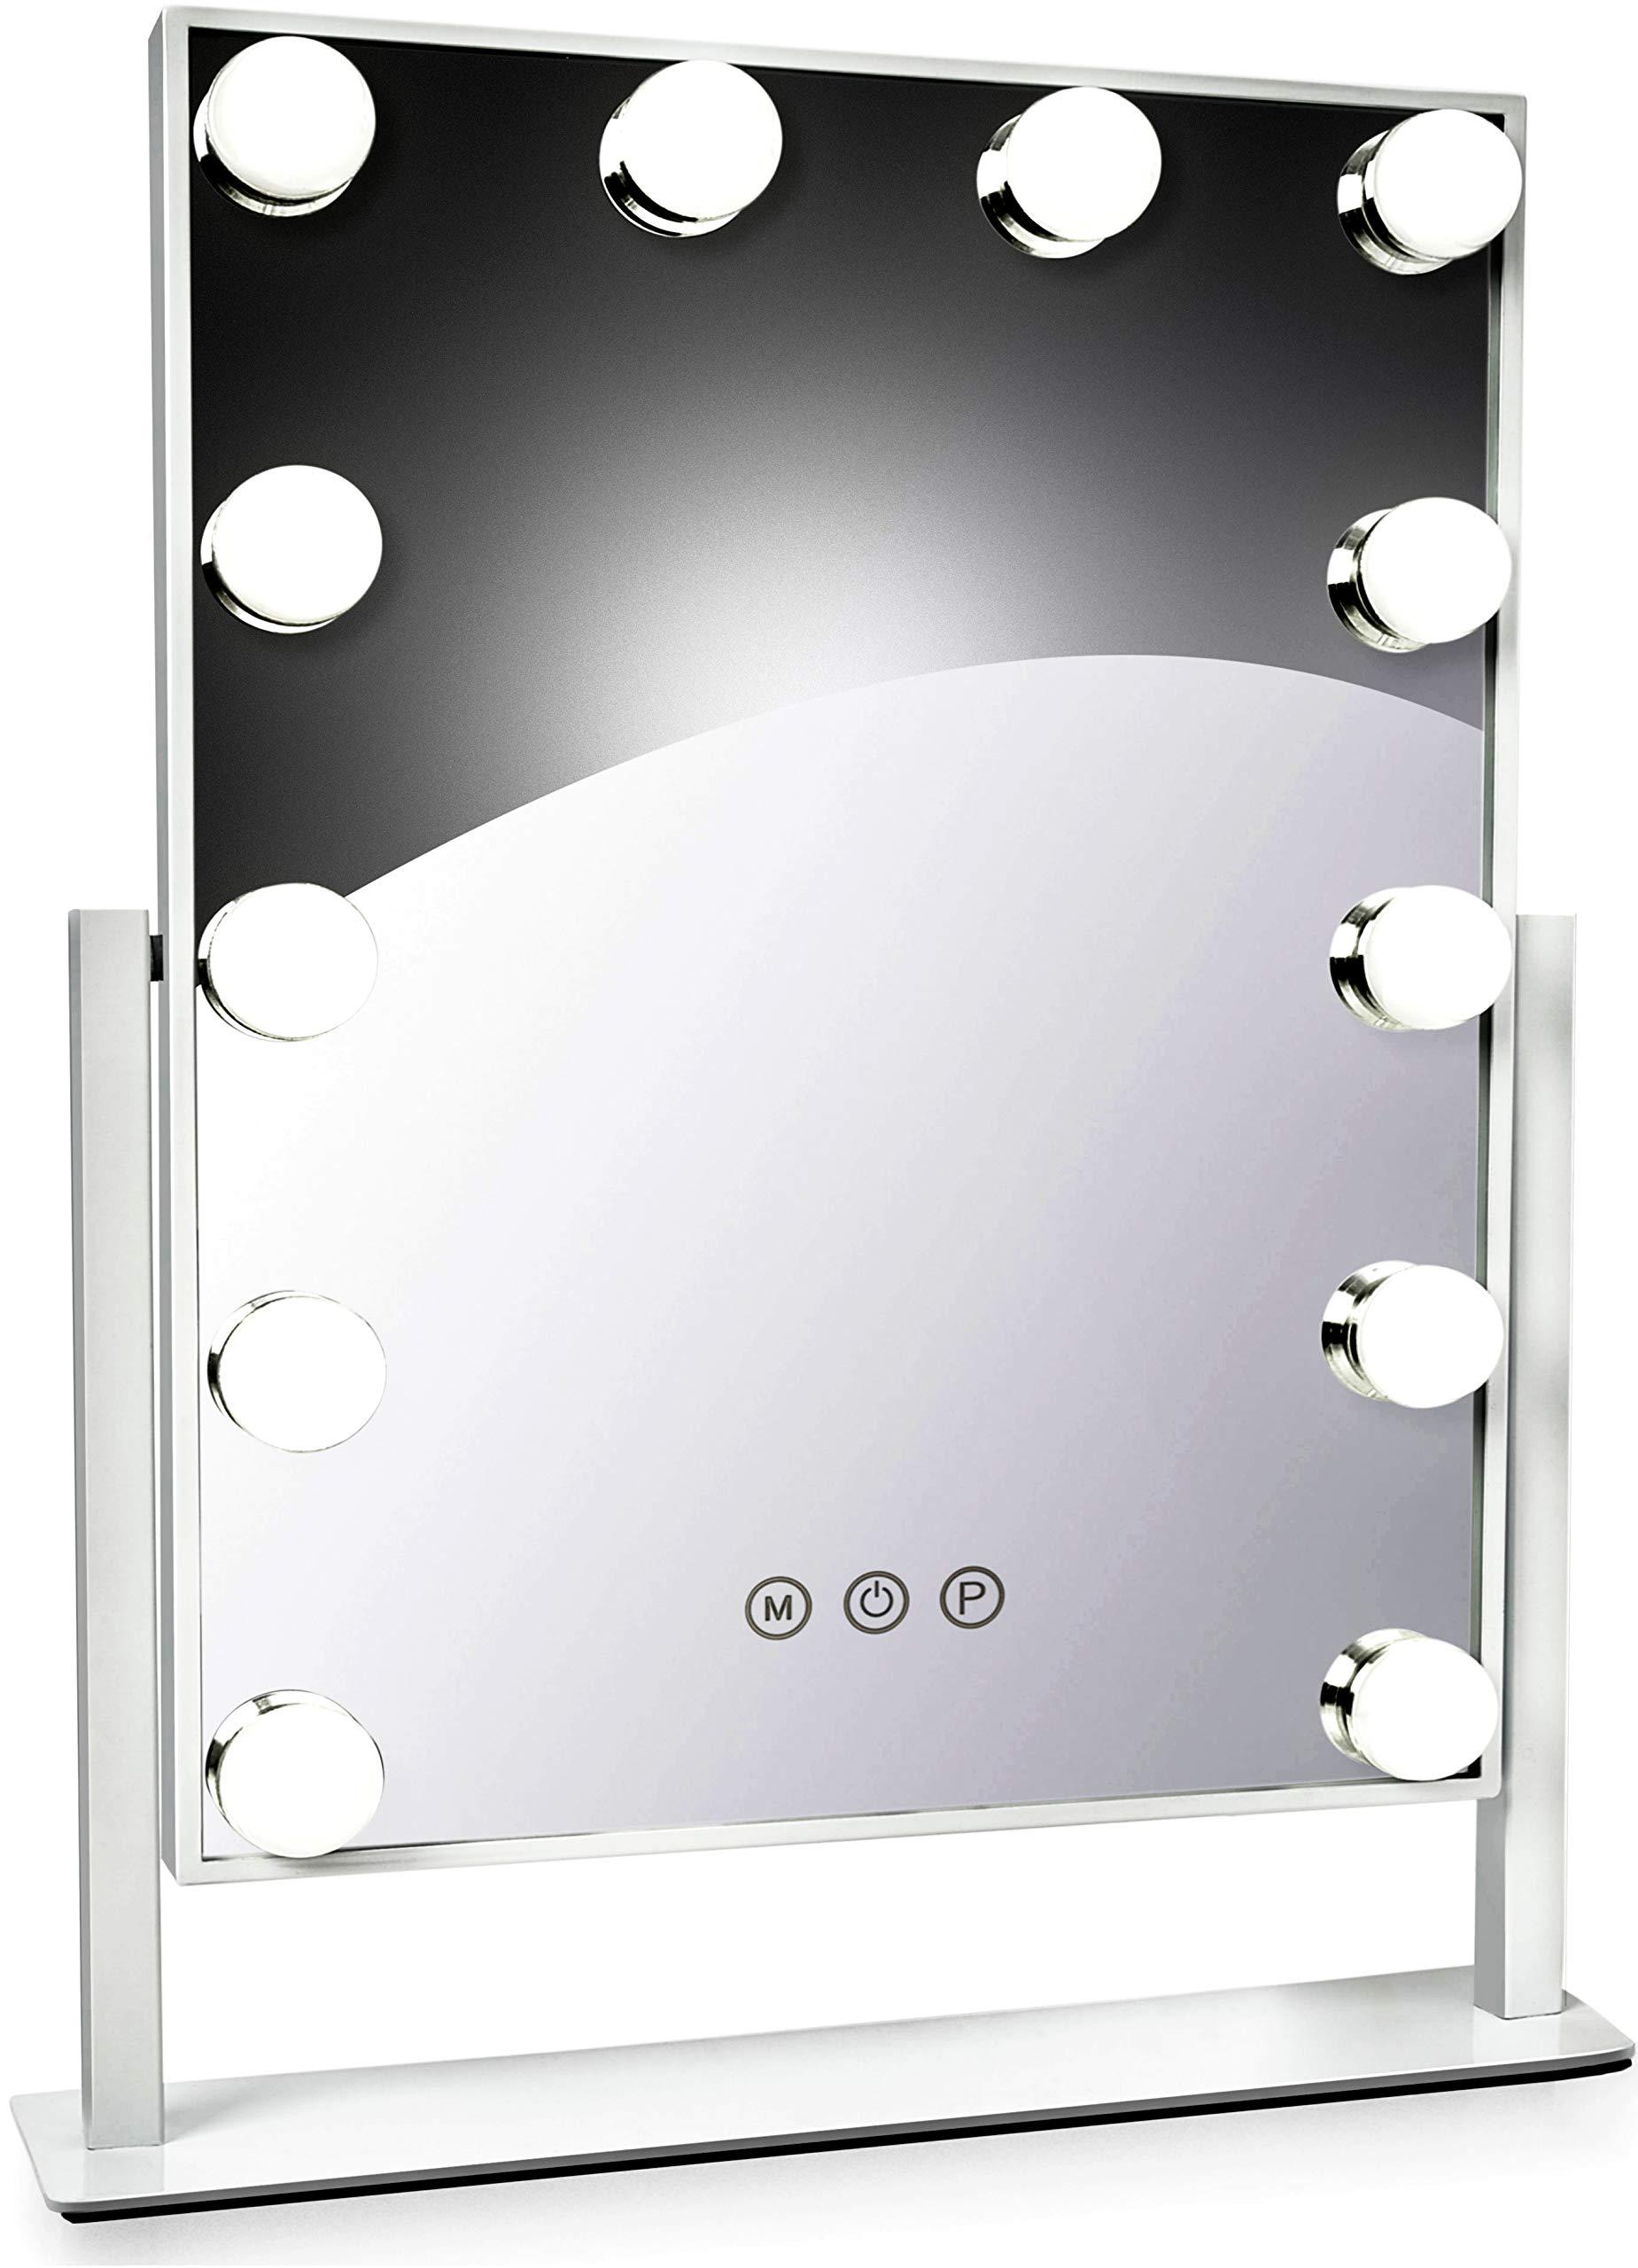 Albor Makeup Vanity Mirror with Lights - Lighted Makeup Mirror with Lights Mirrors Led Mirror Makeup Light Lighted Mirror Vanity Lights Makeup Vanity with Lights Vanity Light Led Vanity Mirror by Albor